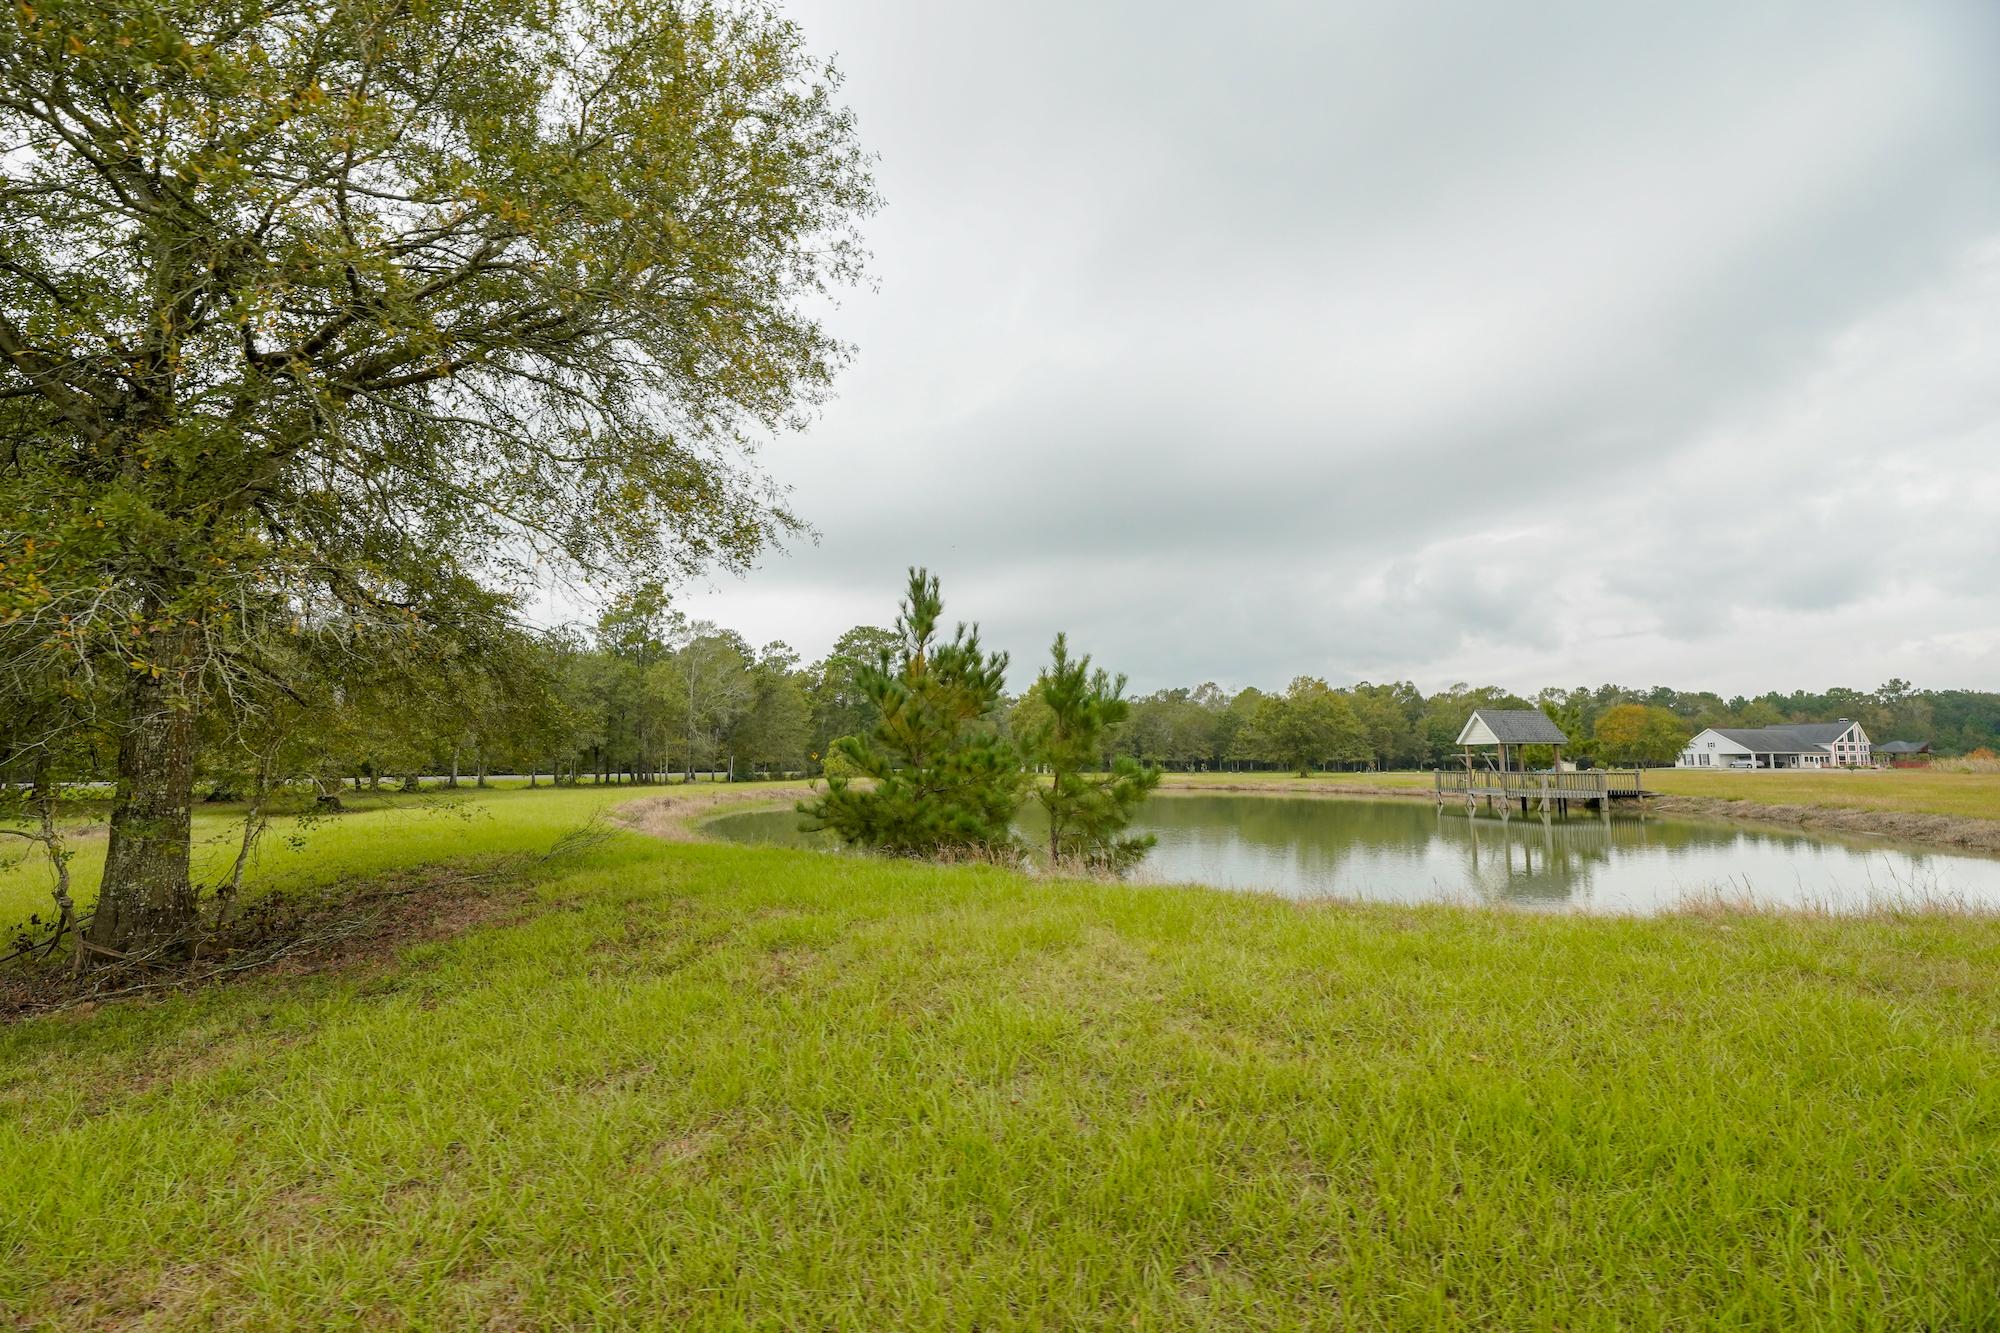 Jefferson County Development Land - Image 23 of 36